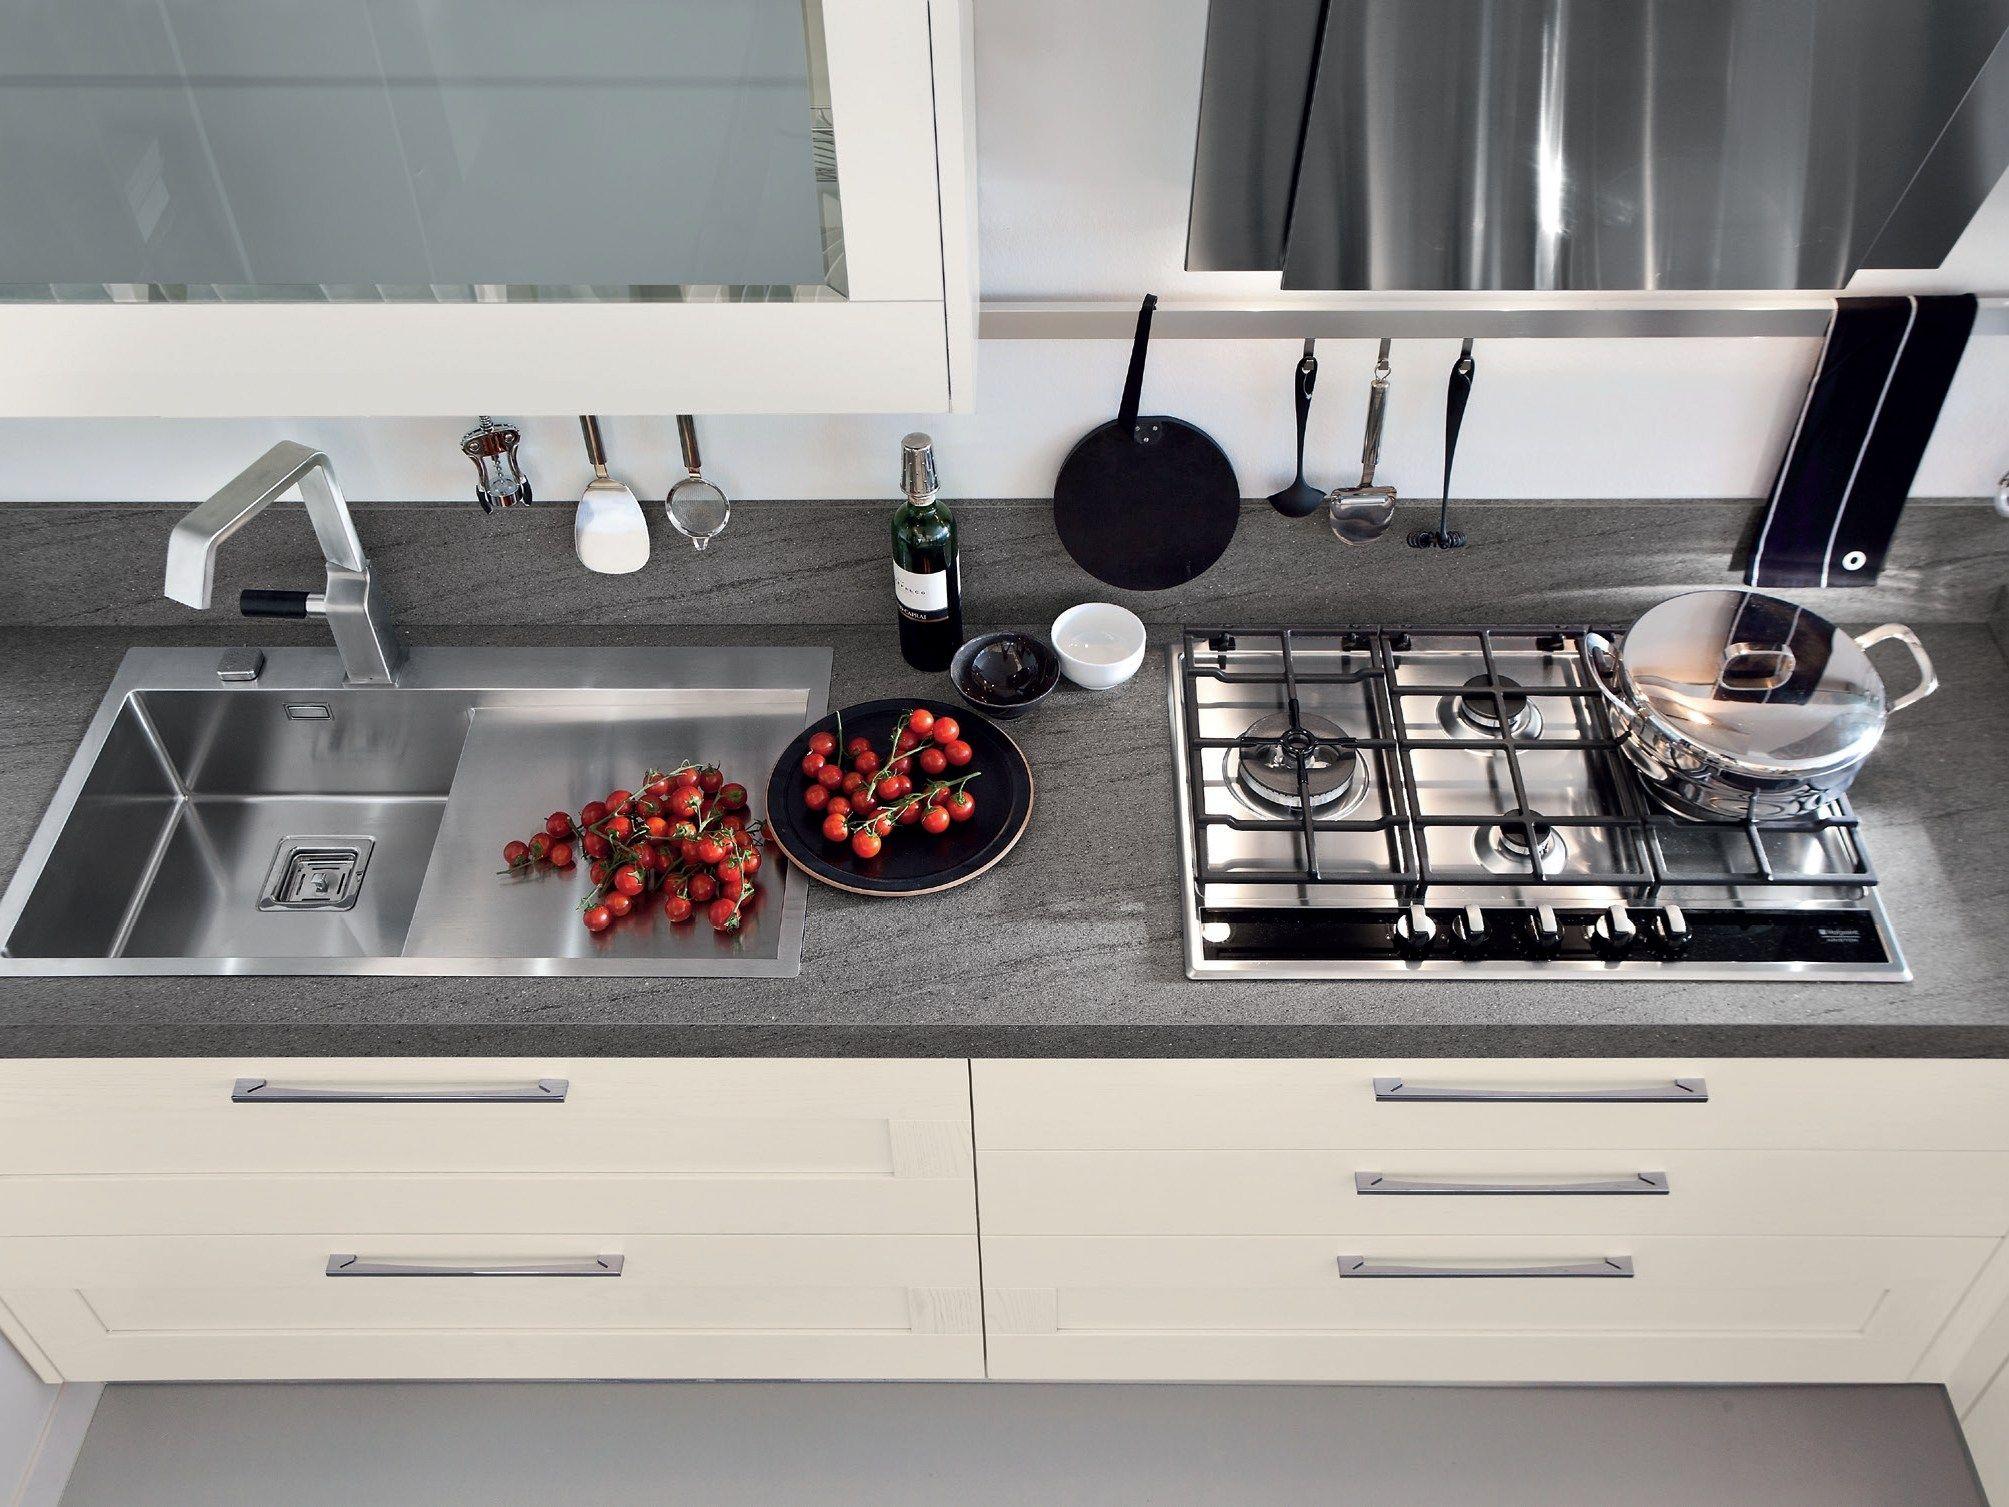 GALLERY Cucina con maniglie by Cucine Lube